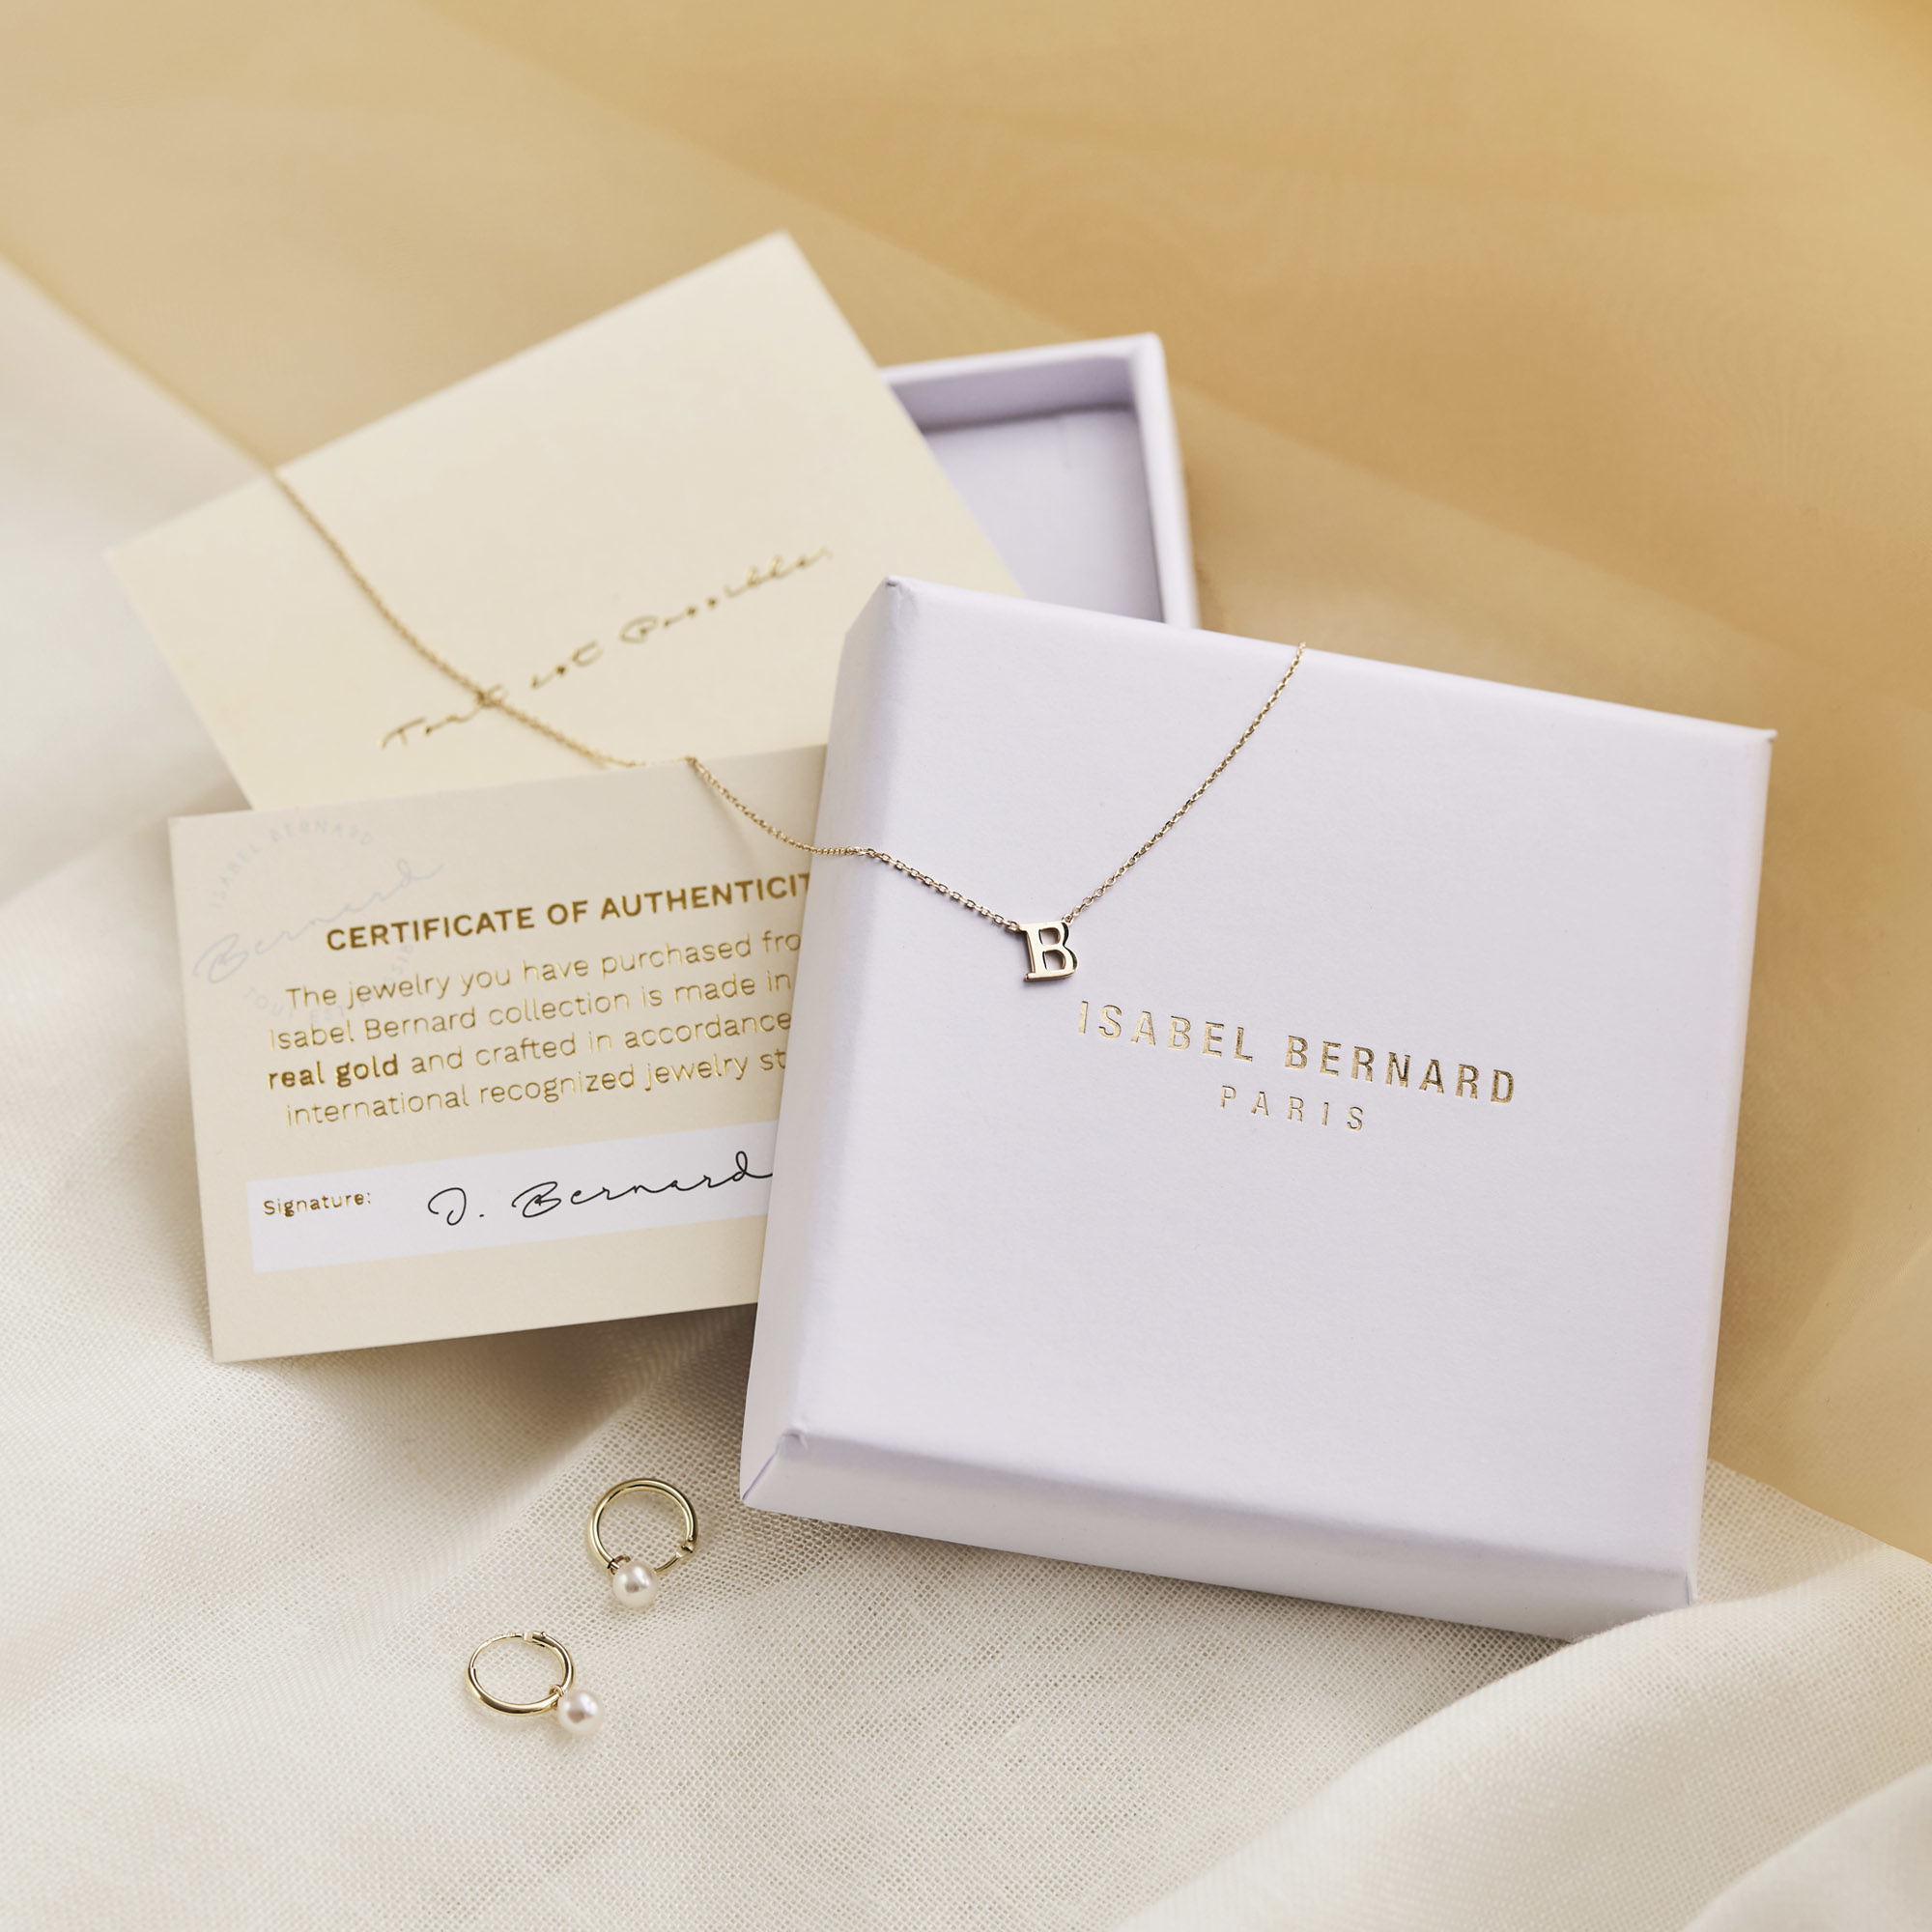 Isabel Bernard Saint Germain Faïs 14 karat white gold bracelet with zirconia